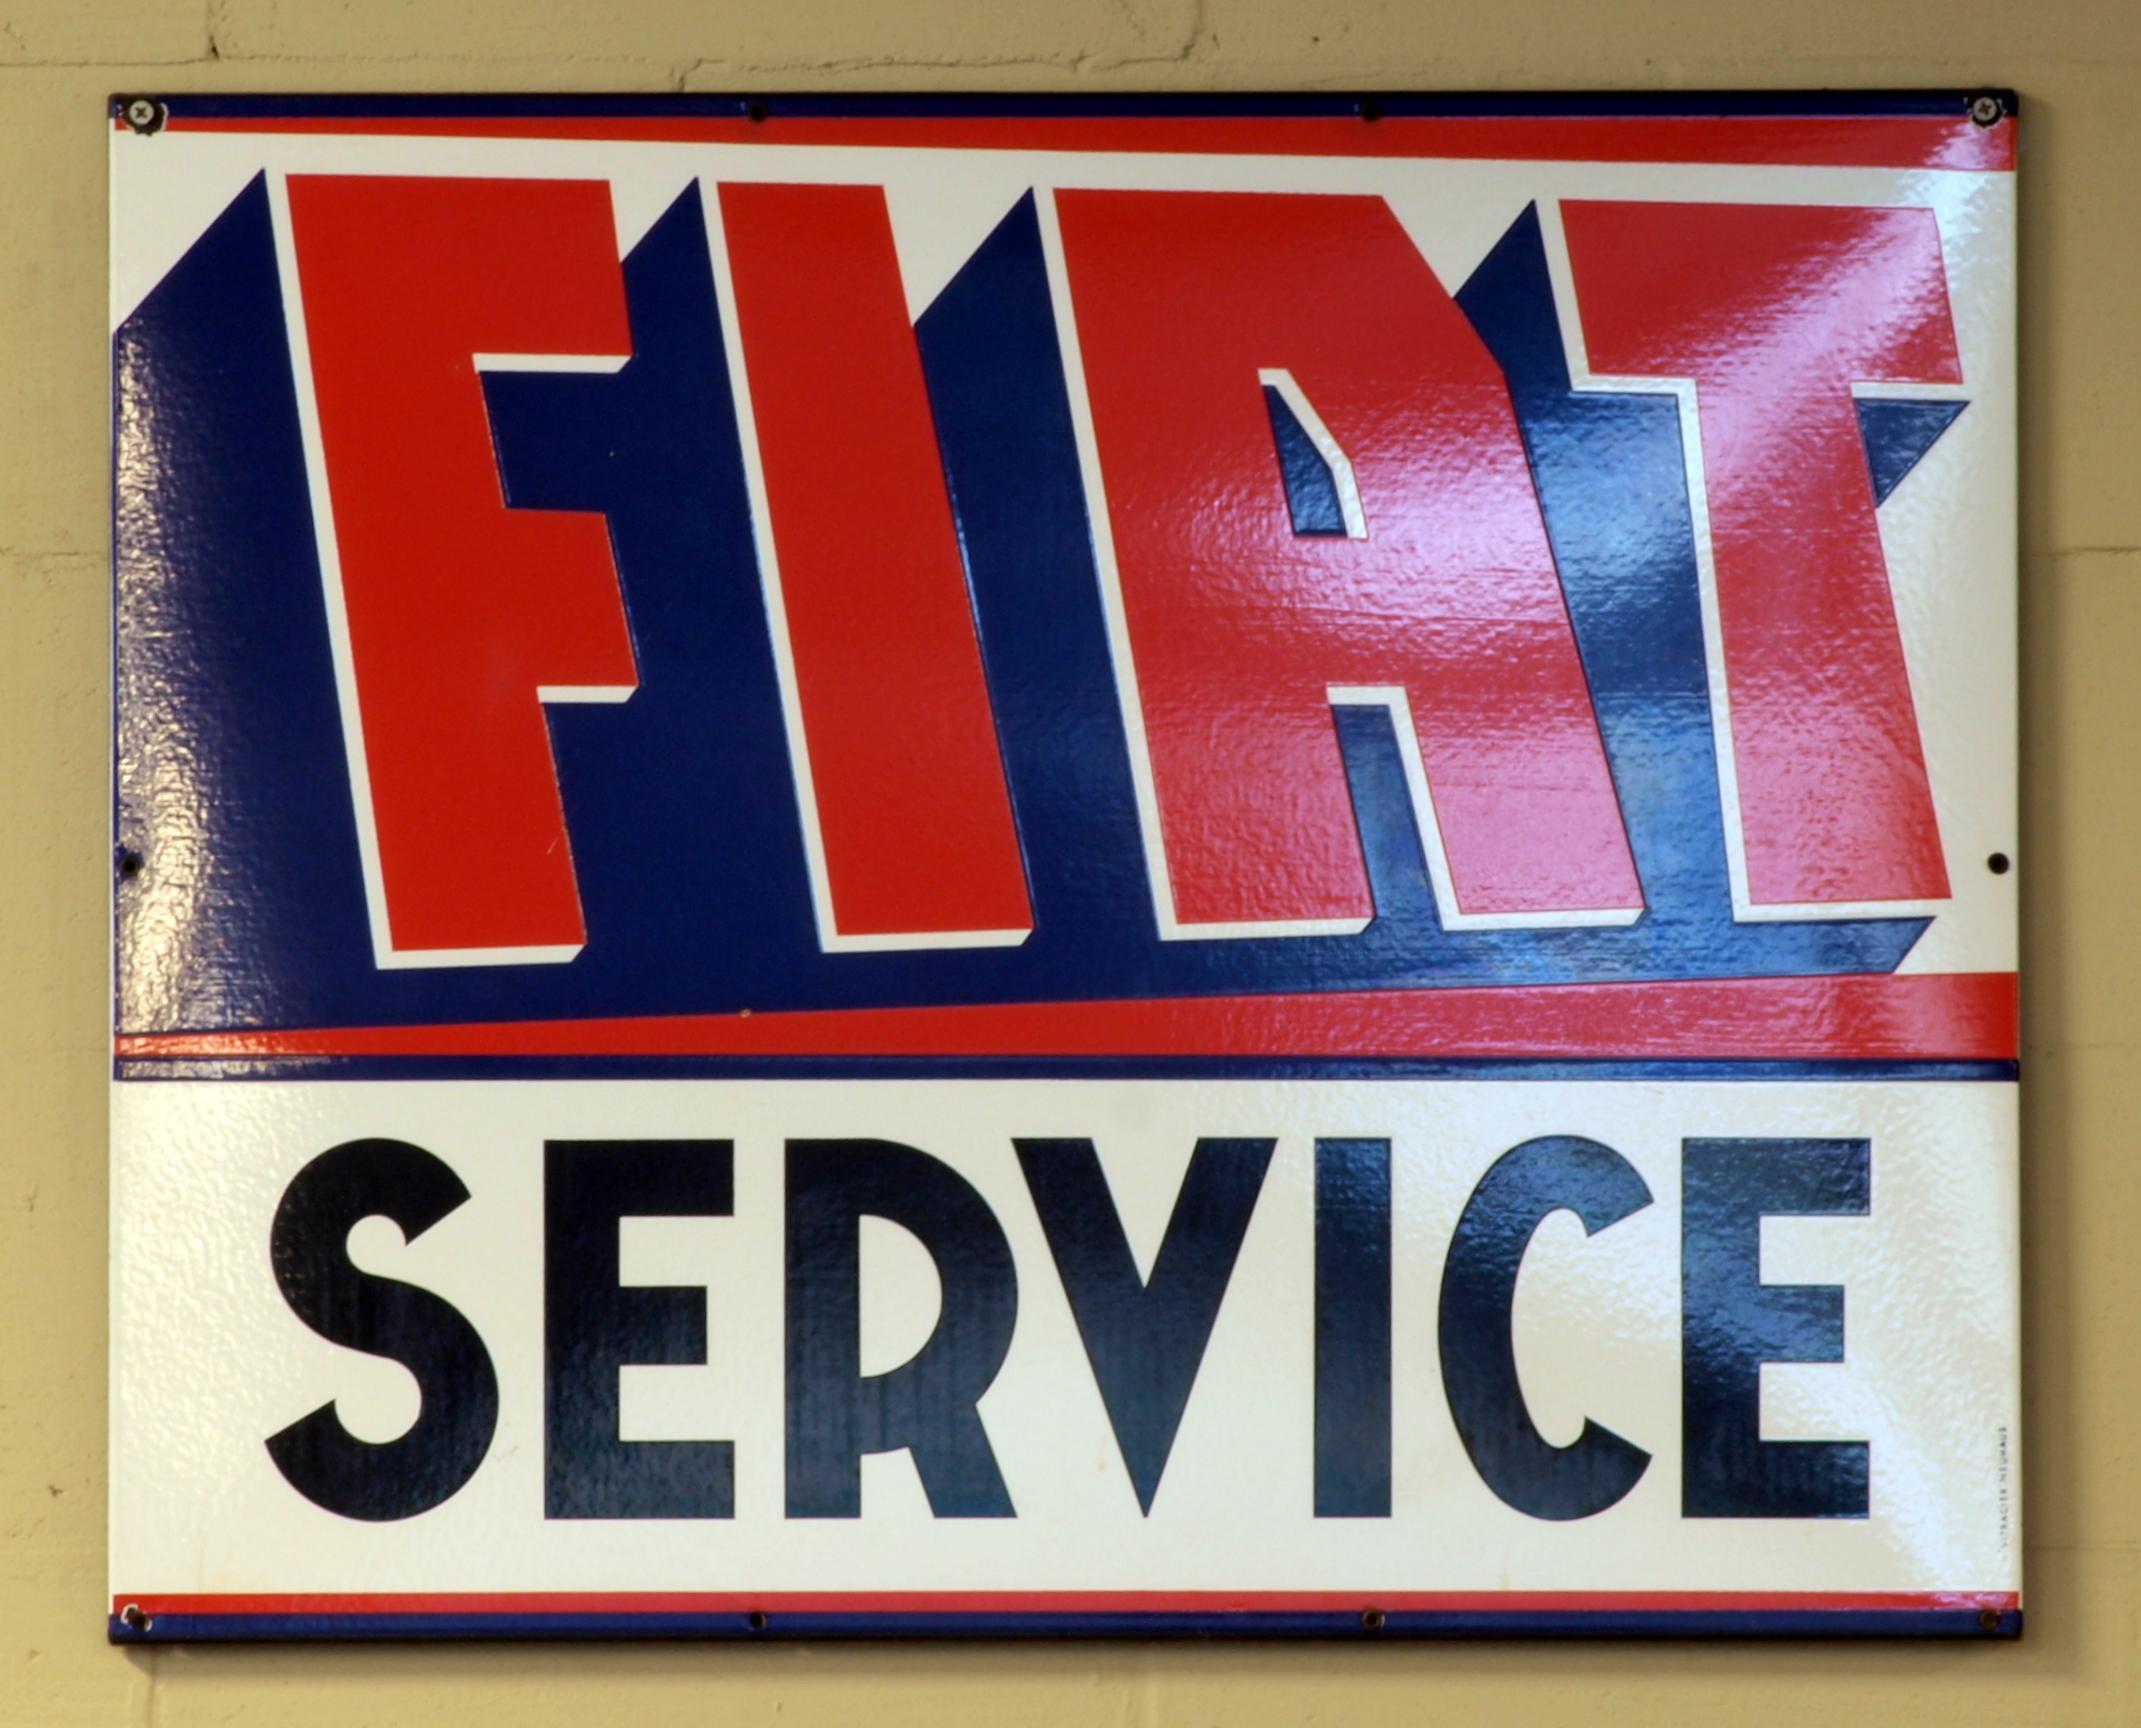 FileFIAT Service Enamel Advert Sign At The Den Hartog Ford - Fiat service